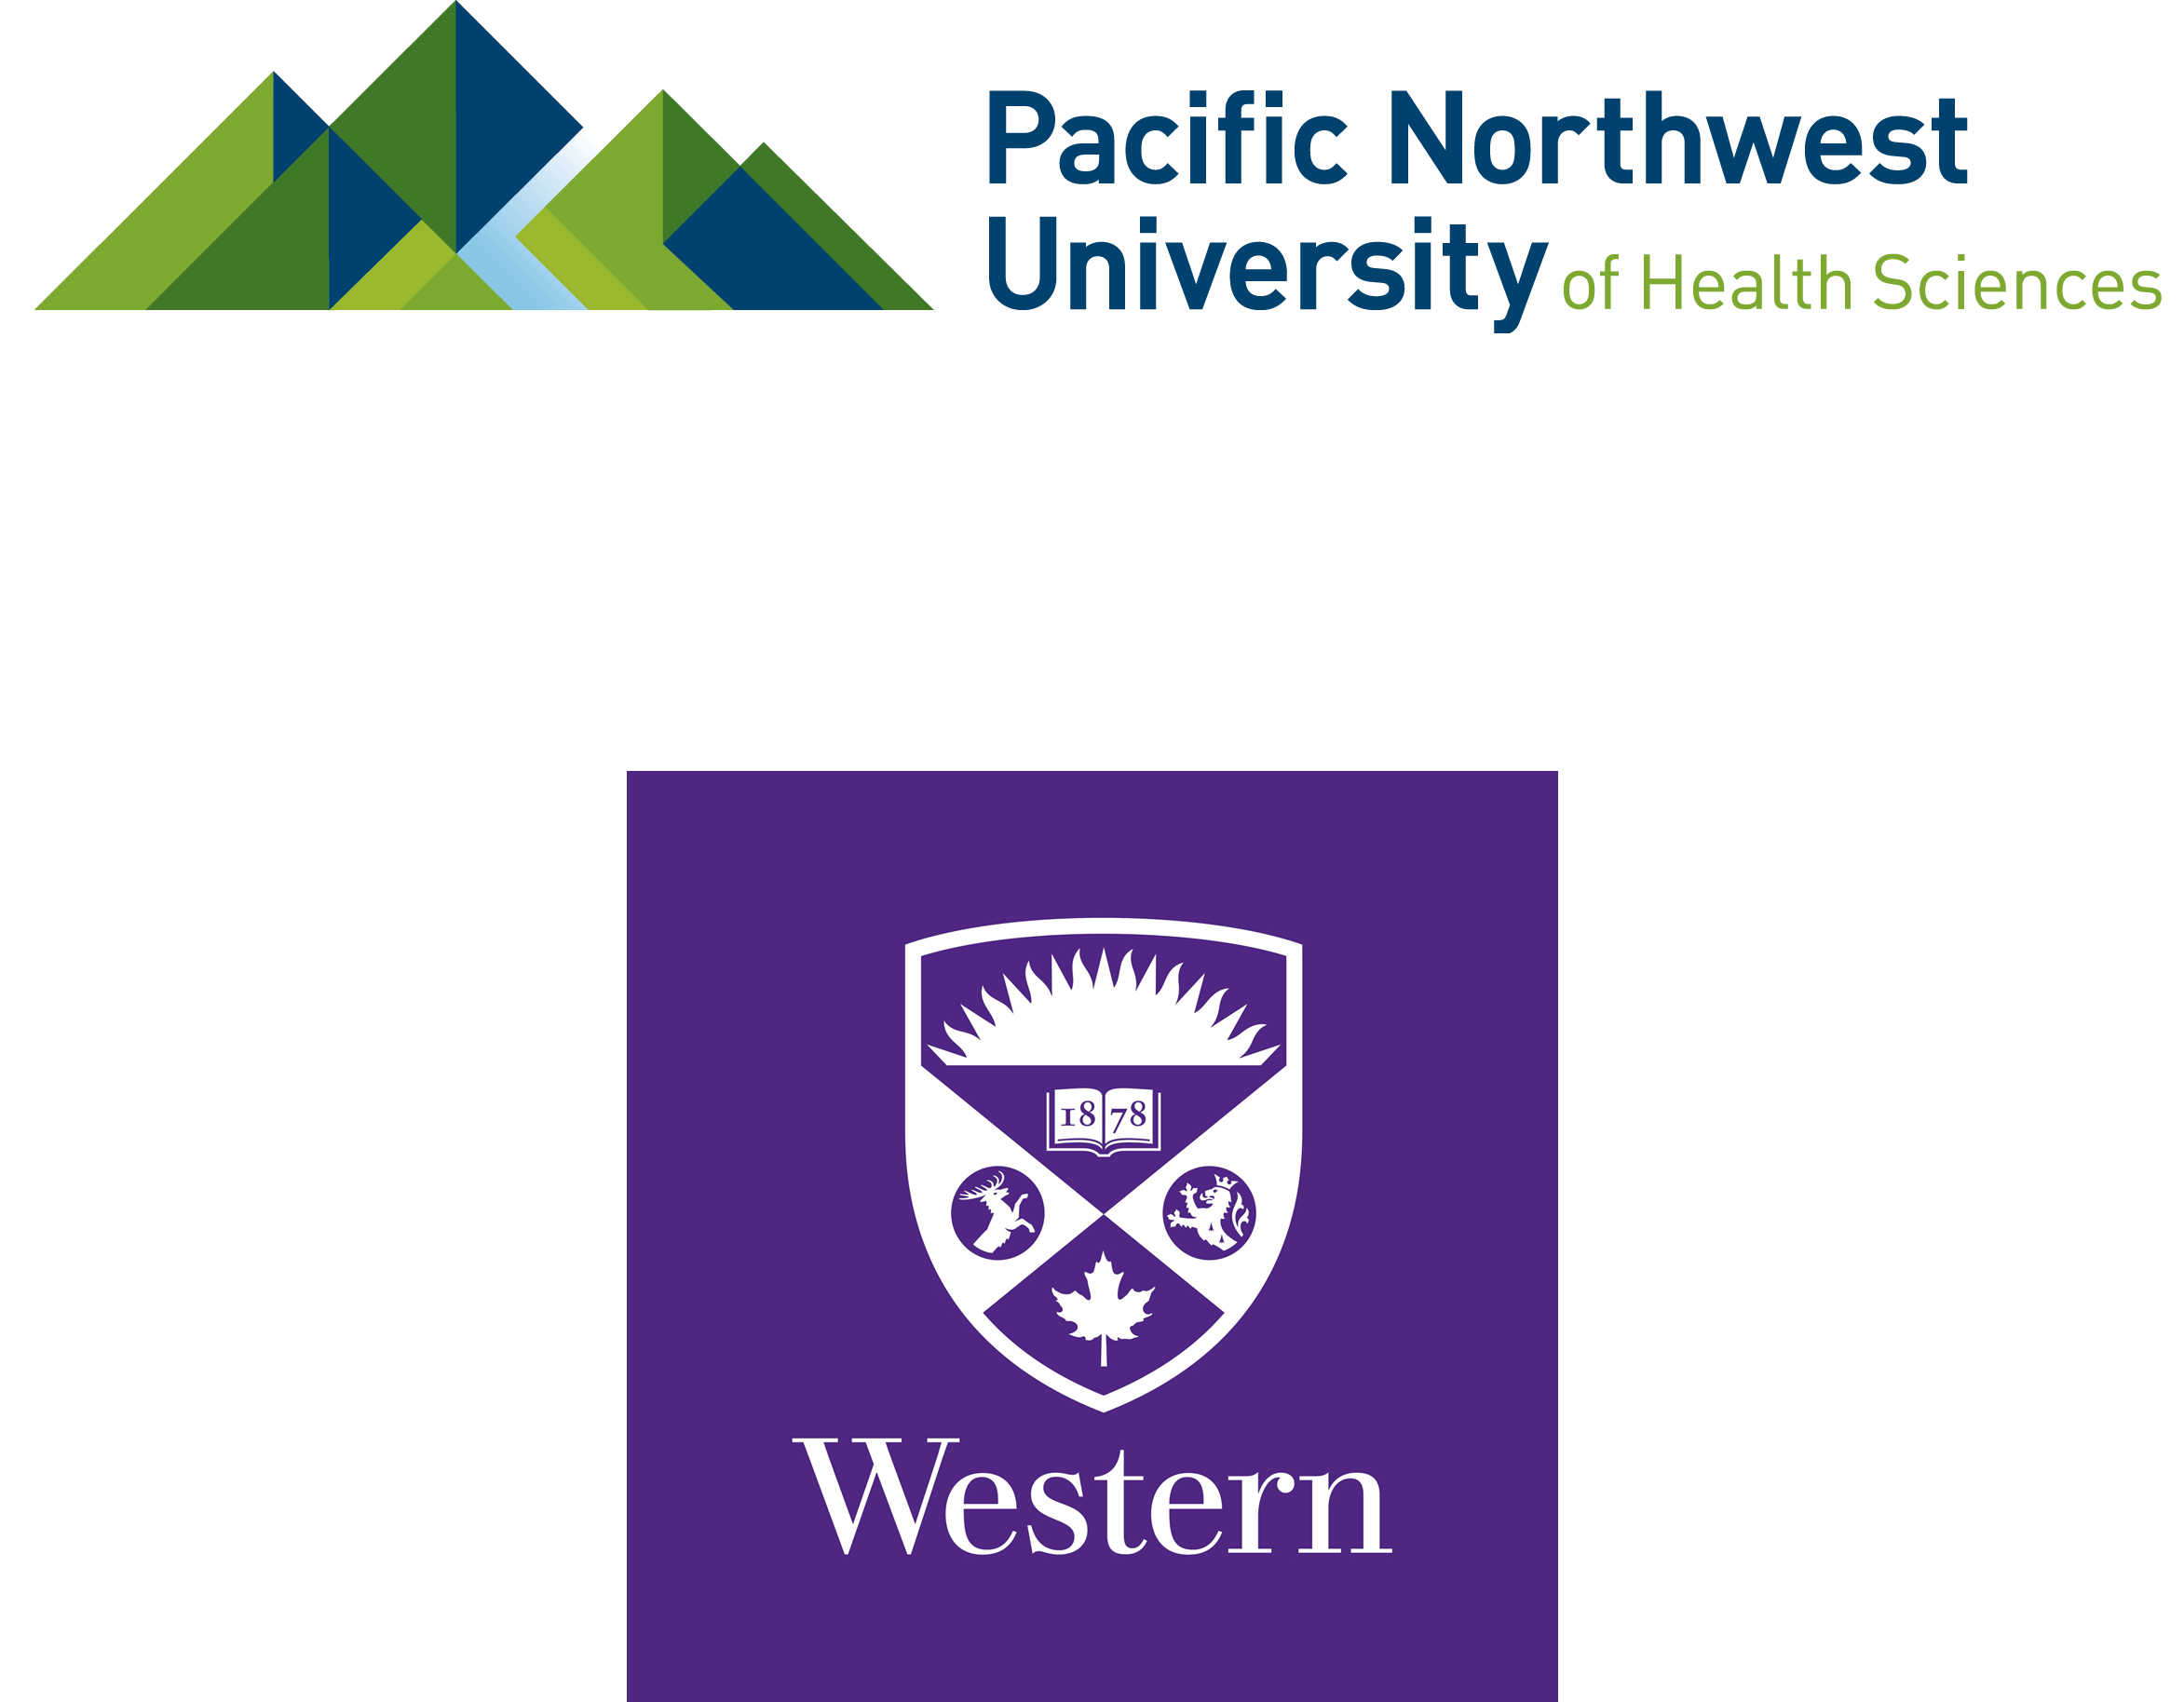 Dr Jordan Harris - Dermatologist in Saratoga Springs, Utah County, UT - Western University & Pacific Northwest University